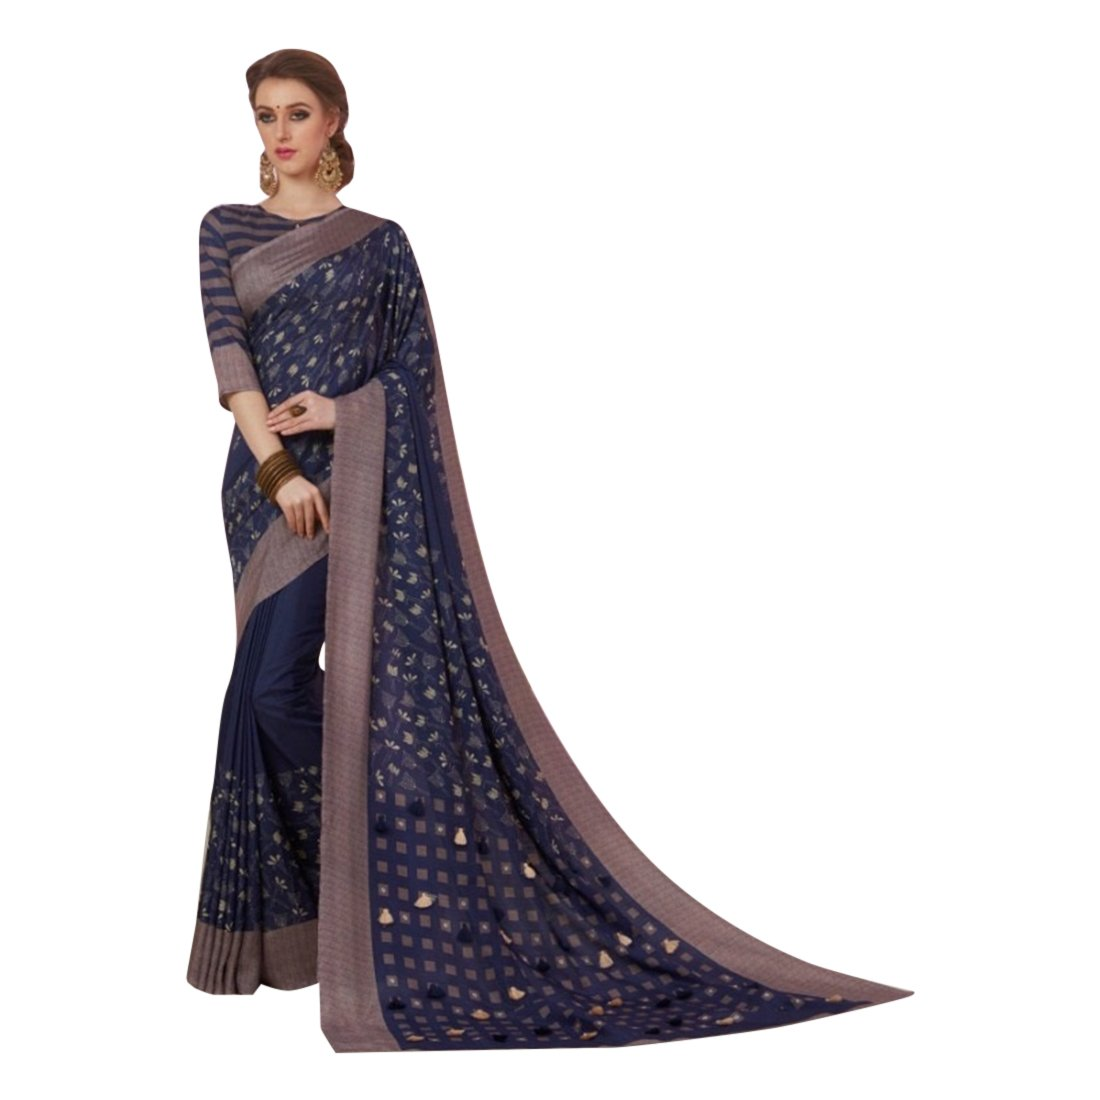 Cotton Silk Indian Bollywood Designer Saree Sari Wedding Ethnic Blouse Ceremony Formal 896